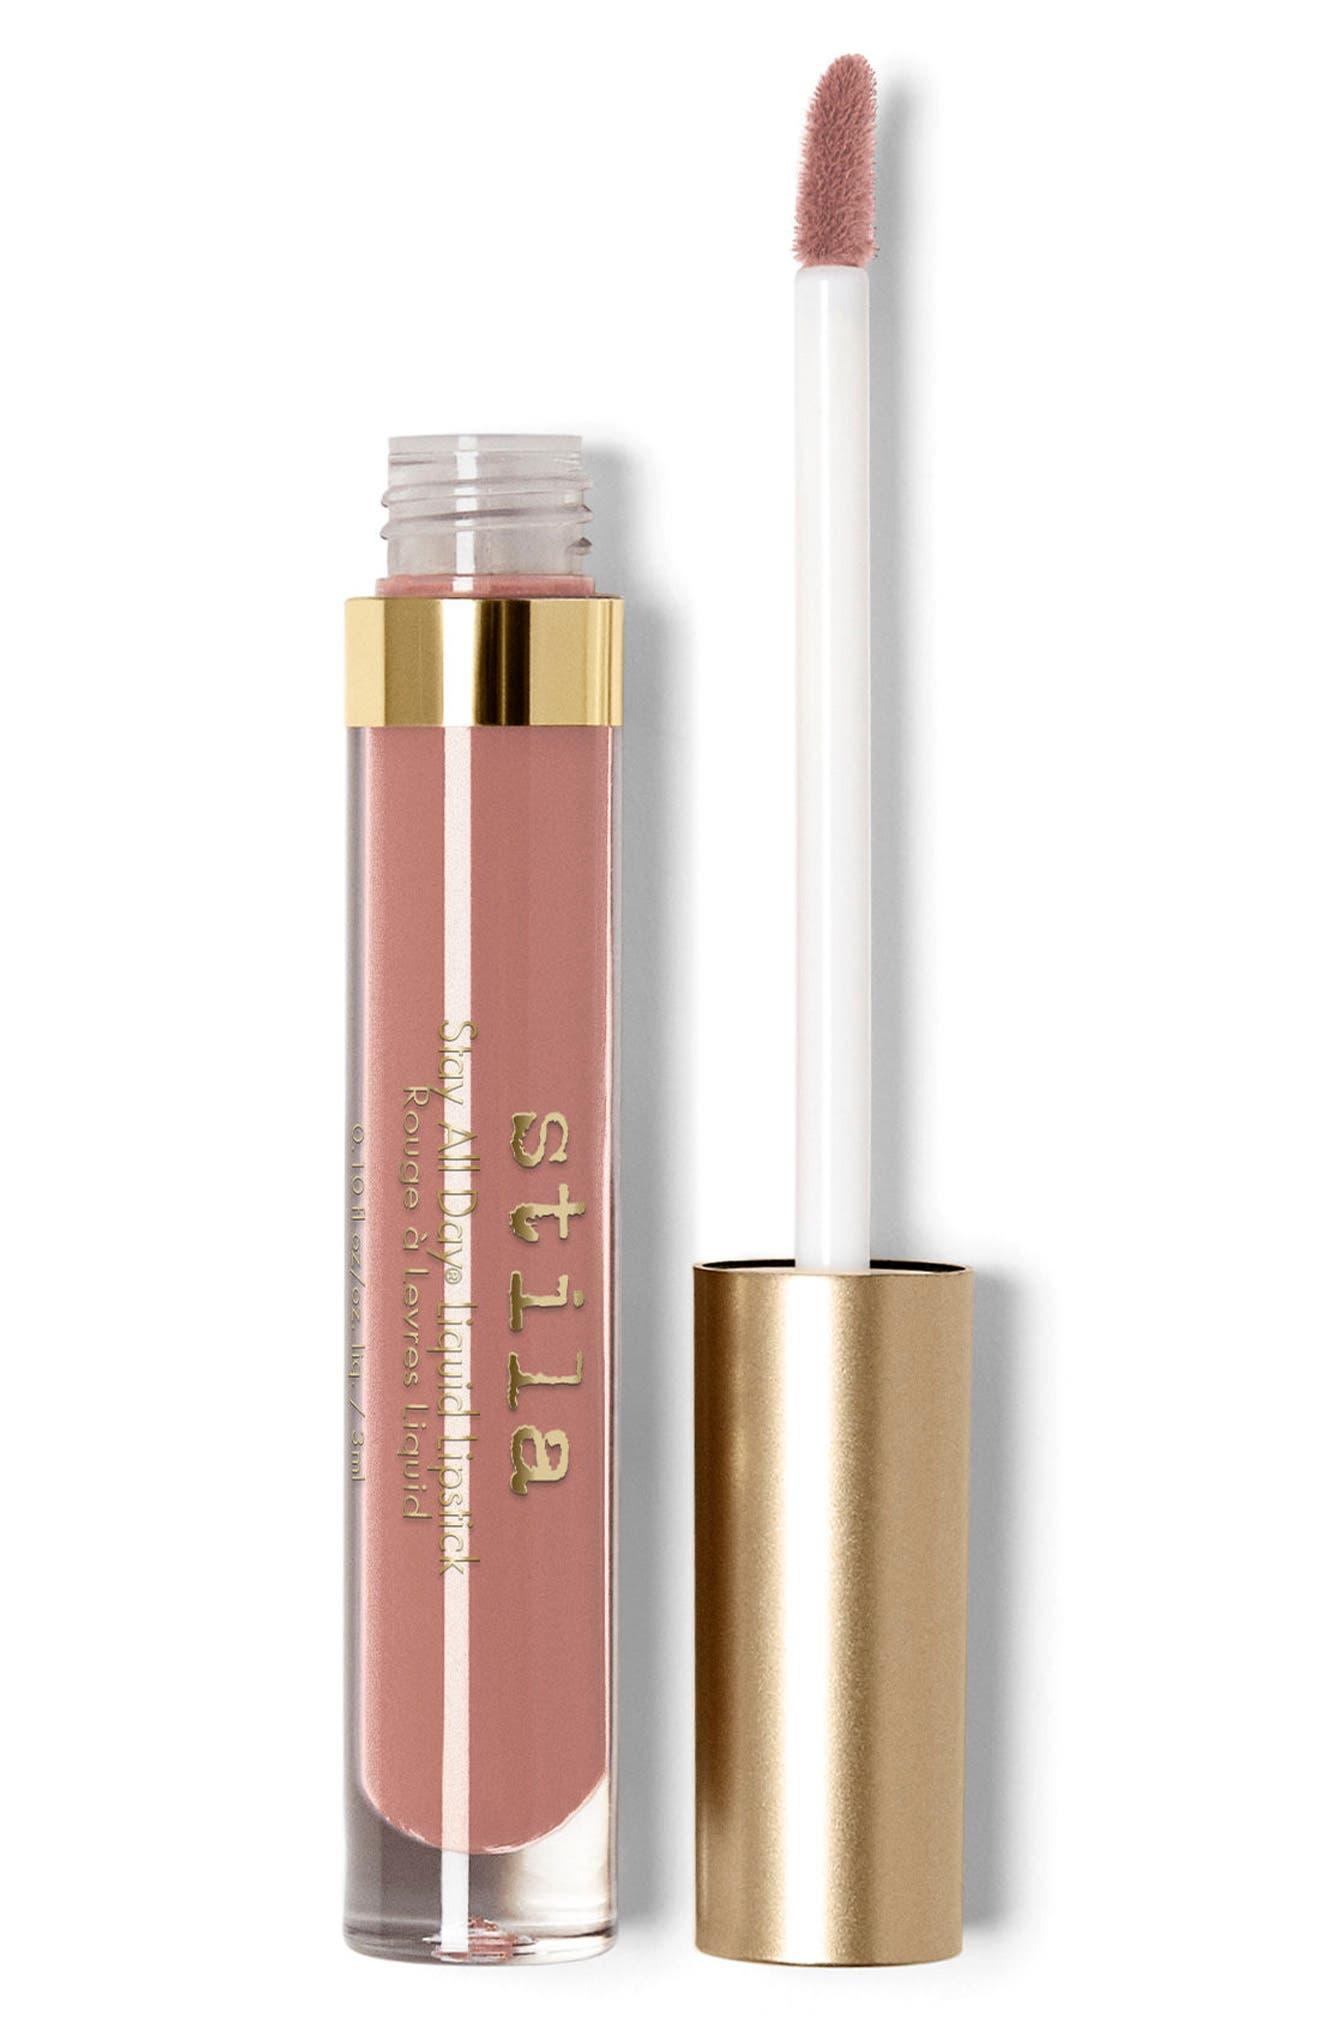 Image of Stila Stay All Day Sheer Liquid Lipstick - Sheer Caramello